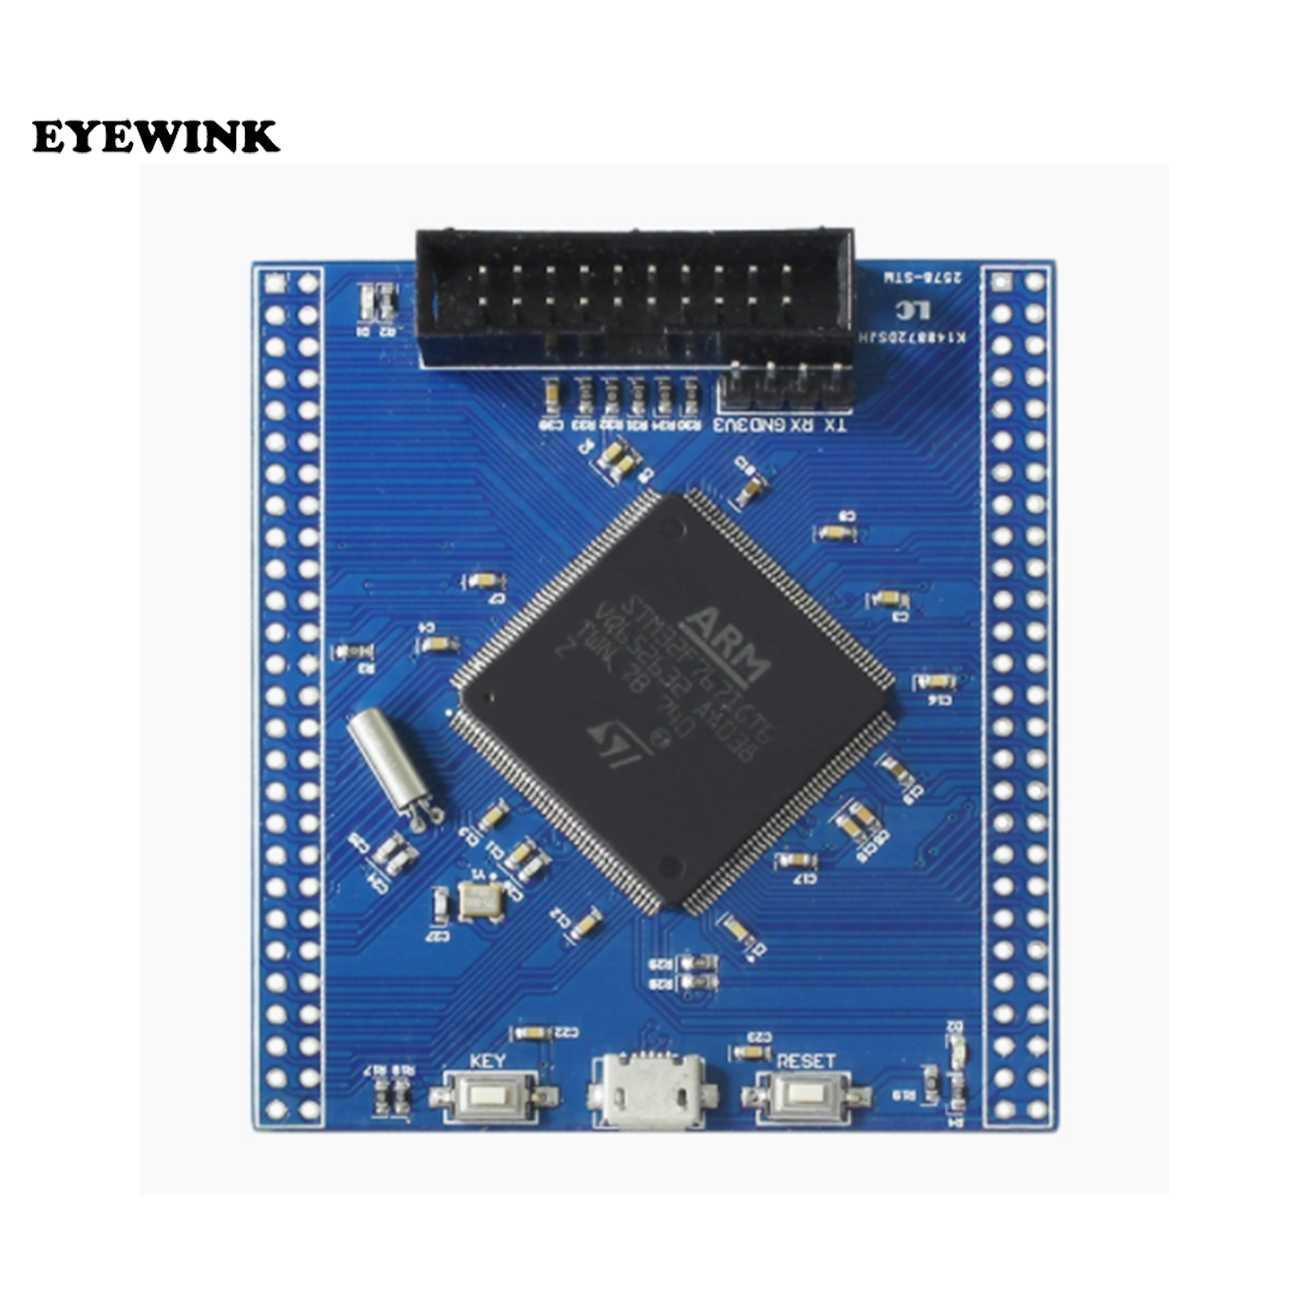 STM32F767 開発ボード Cortex-M7 小規模システムボード STM32F767IGT6 STM32 開発ボード